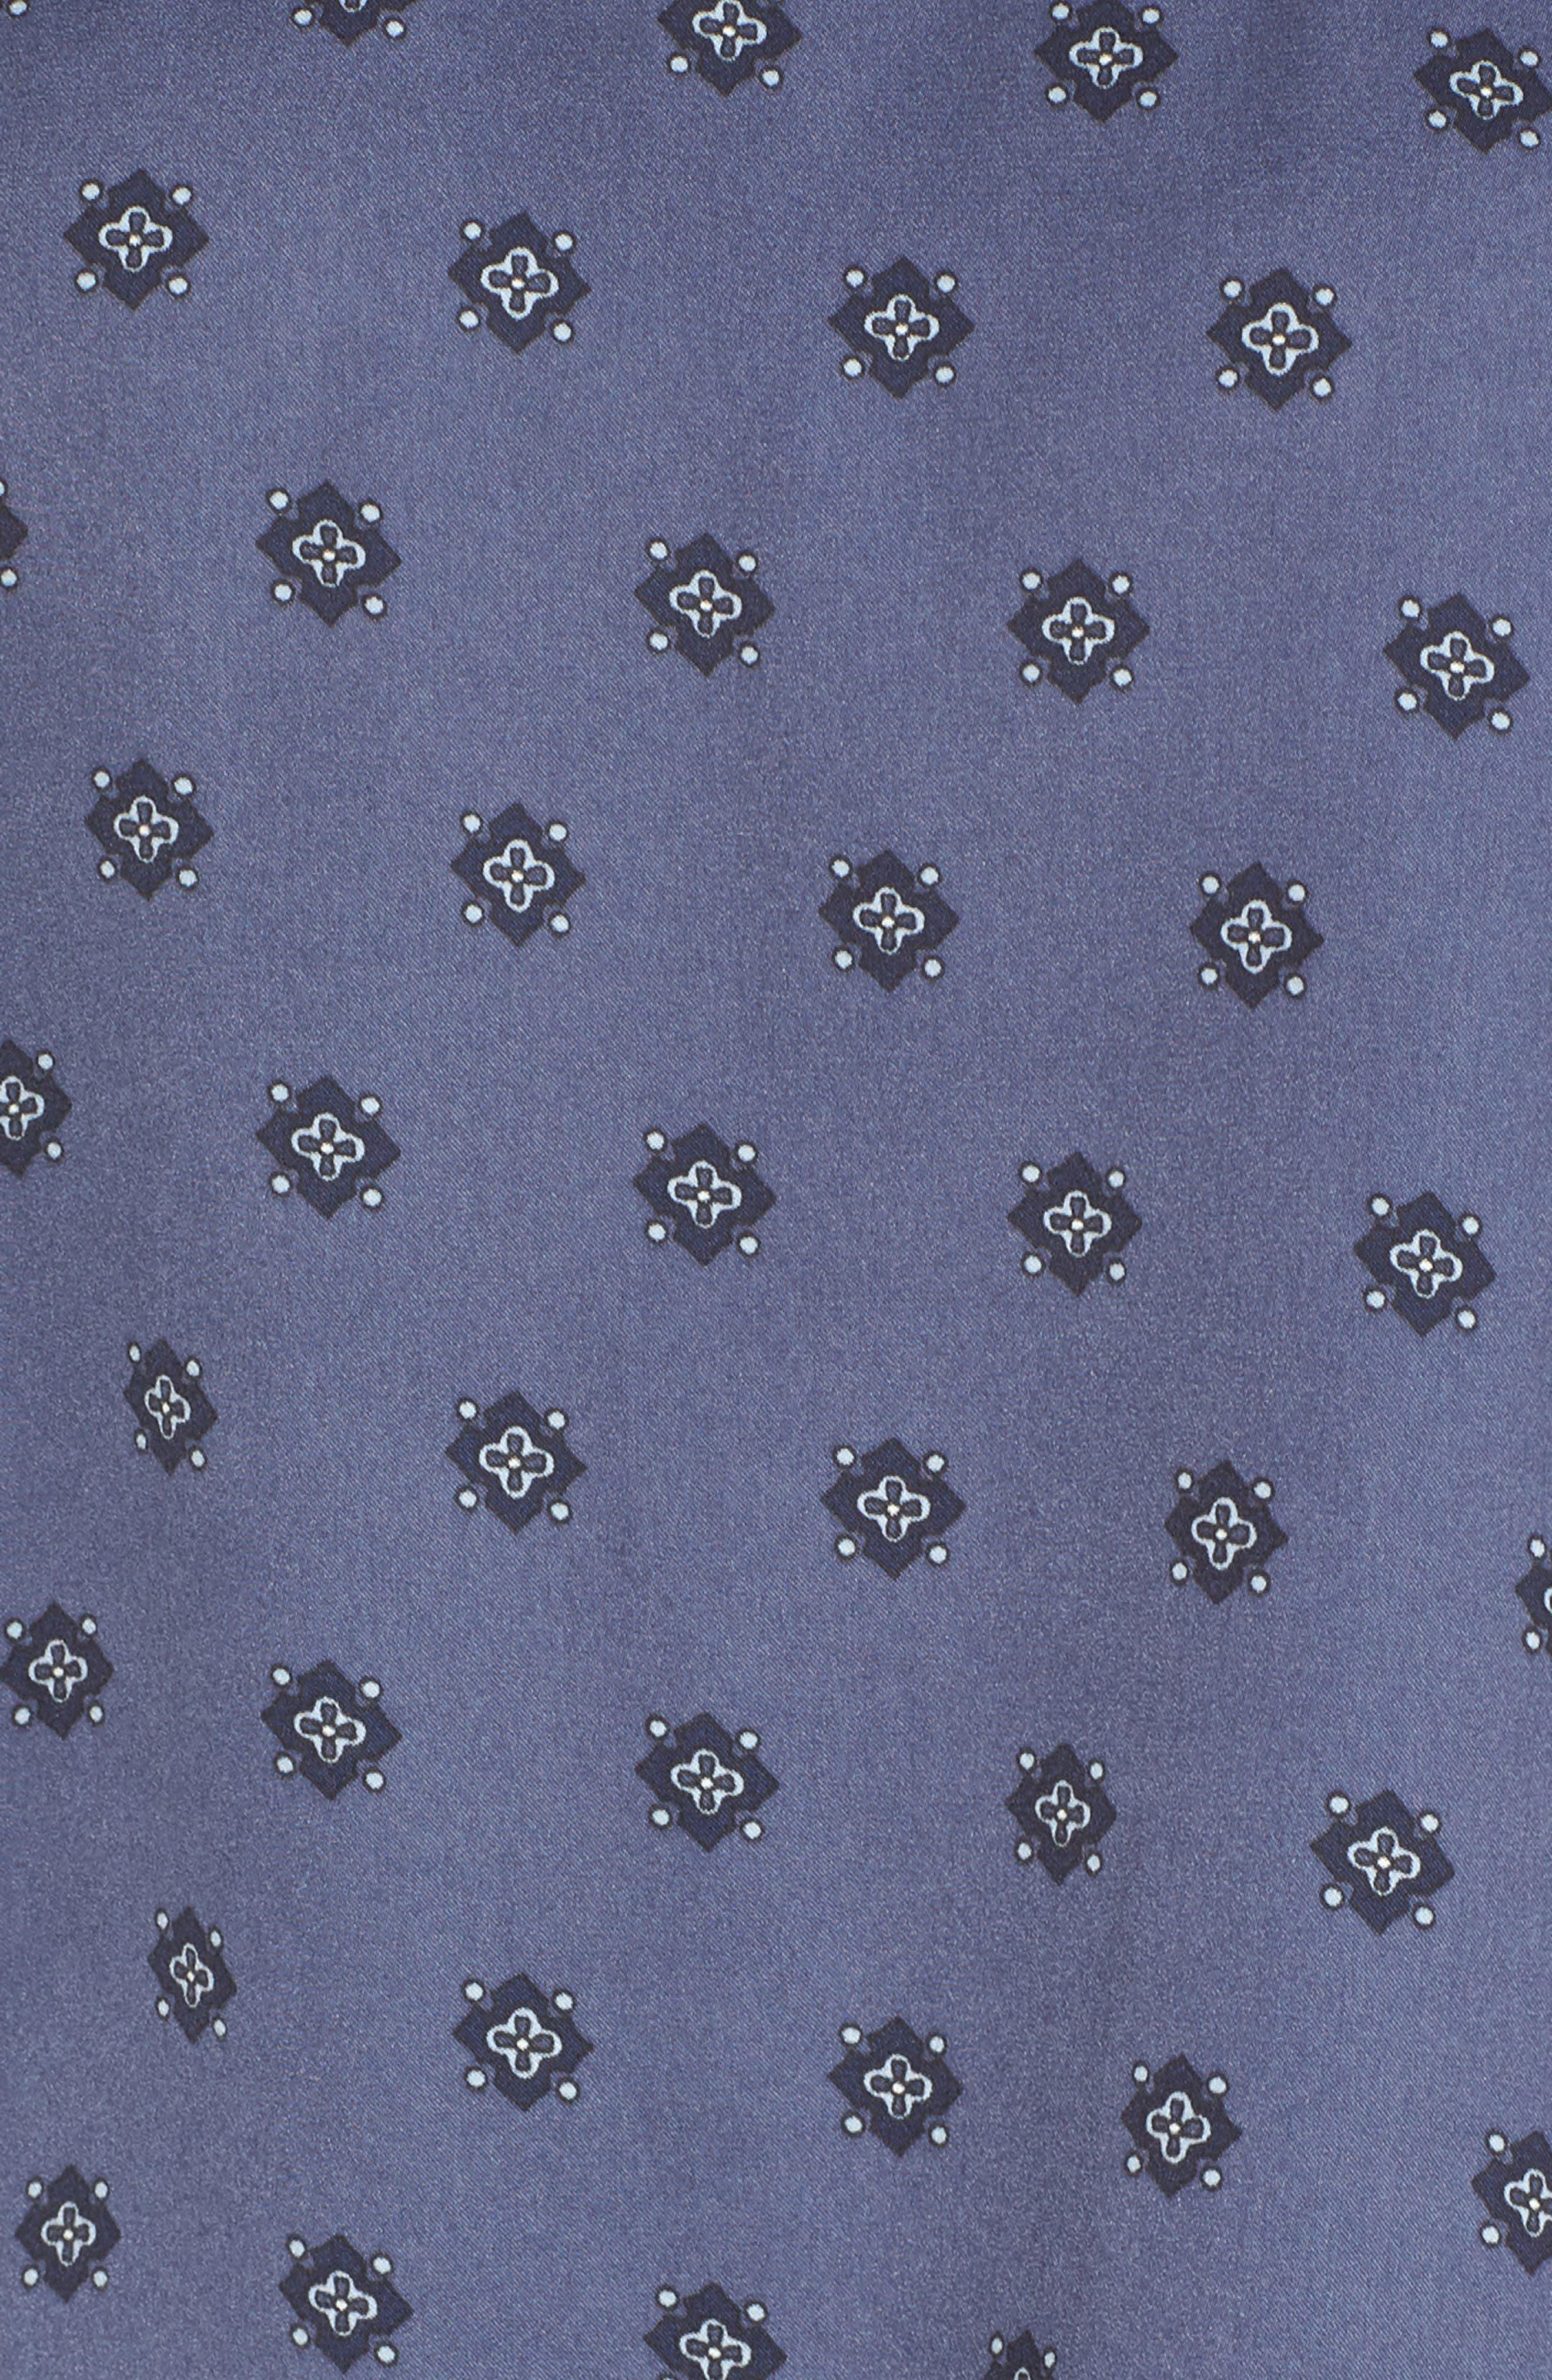 Sweet Dreams Satin Pajamas,                             Alternate thumbnail 5, color,                             401